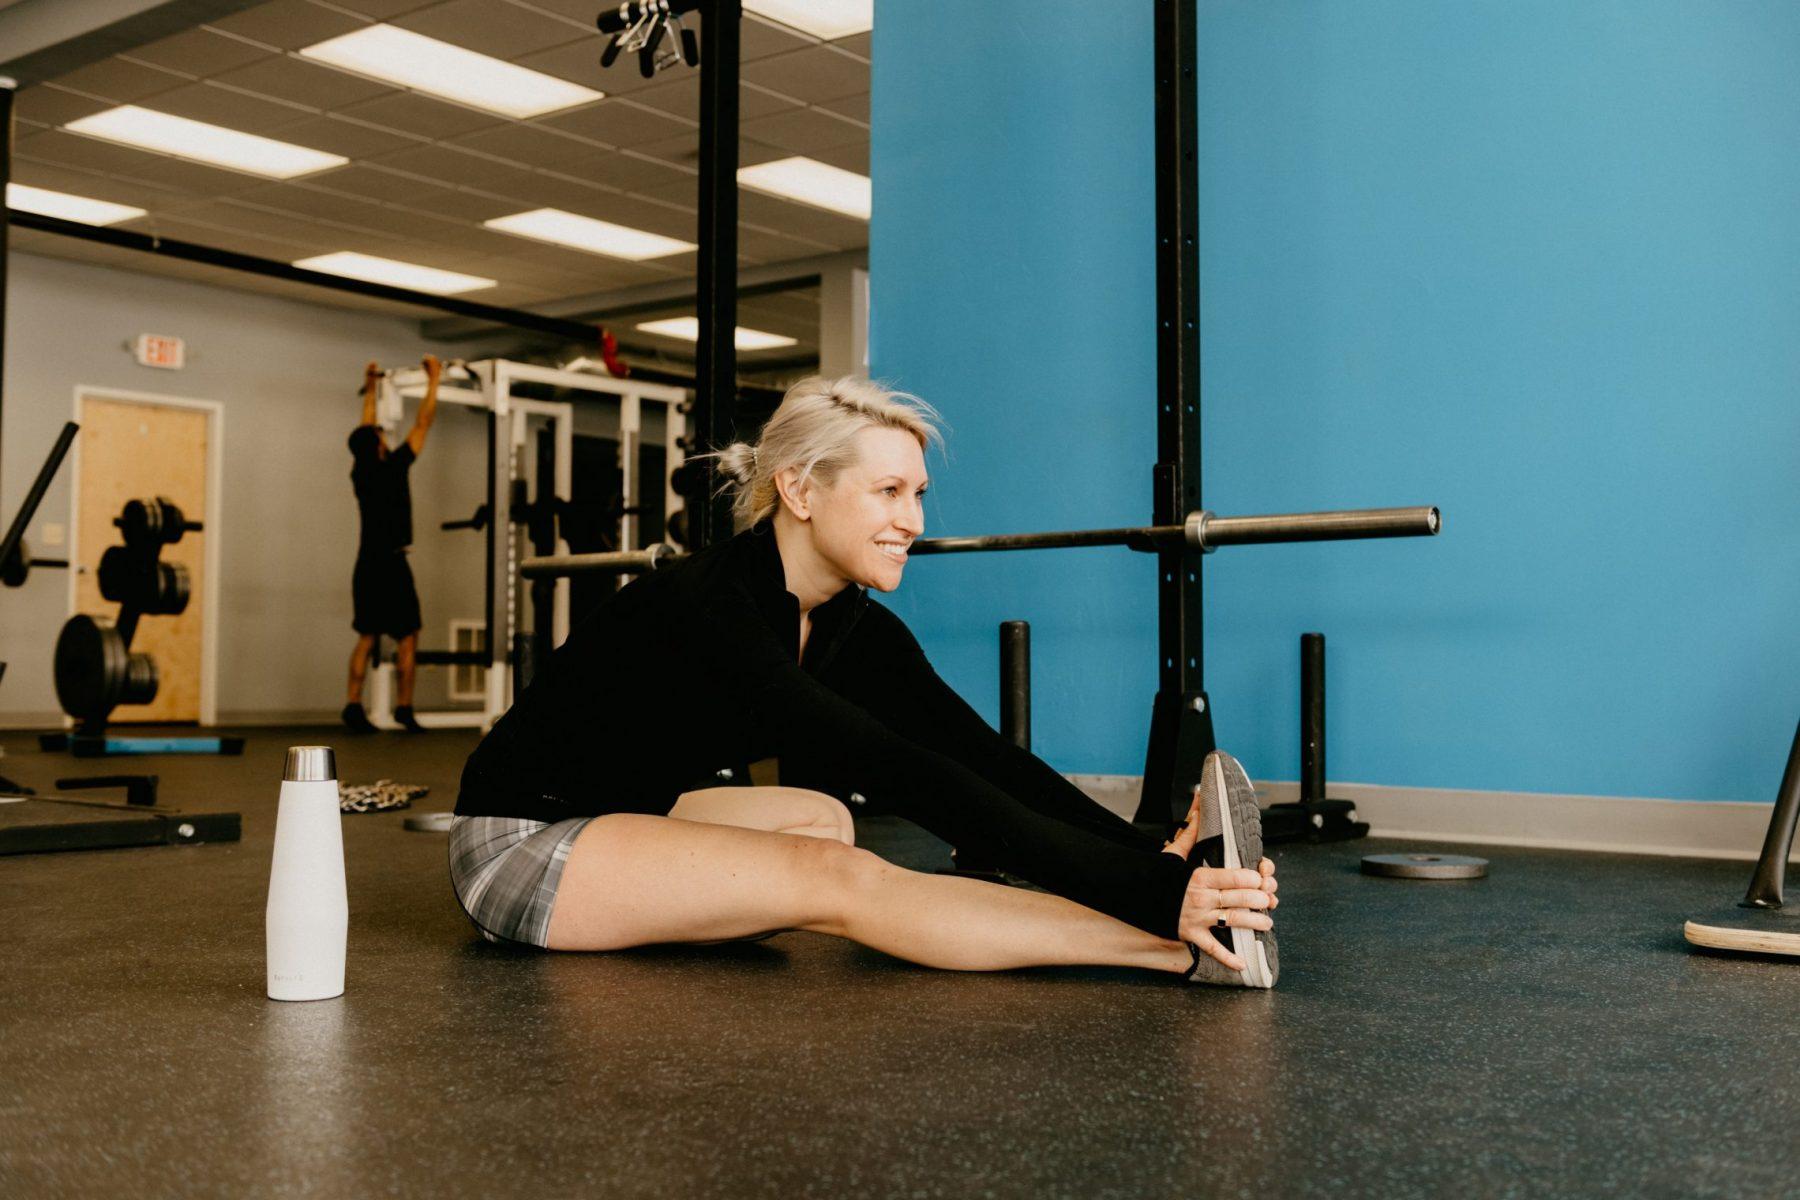 workout women clothing